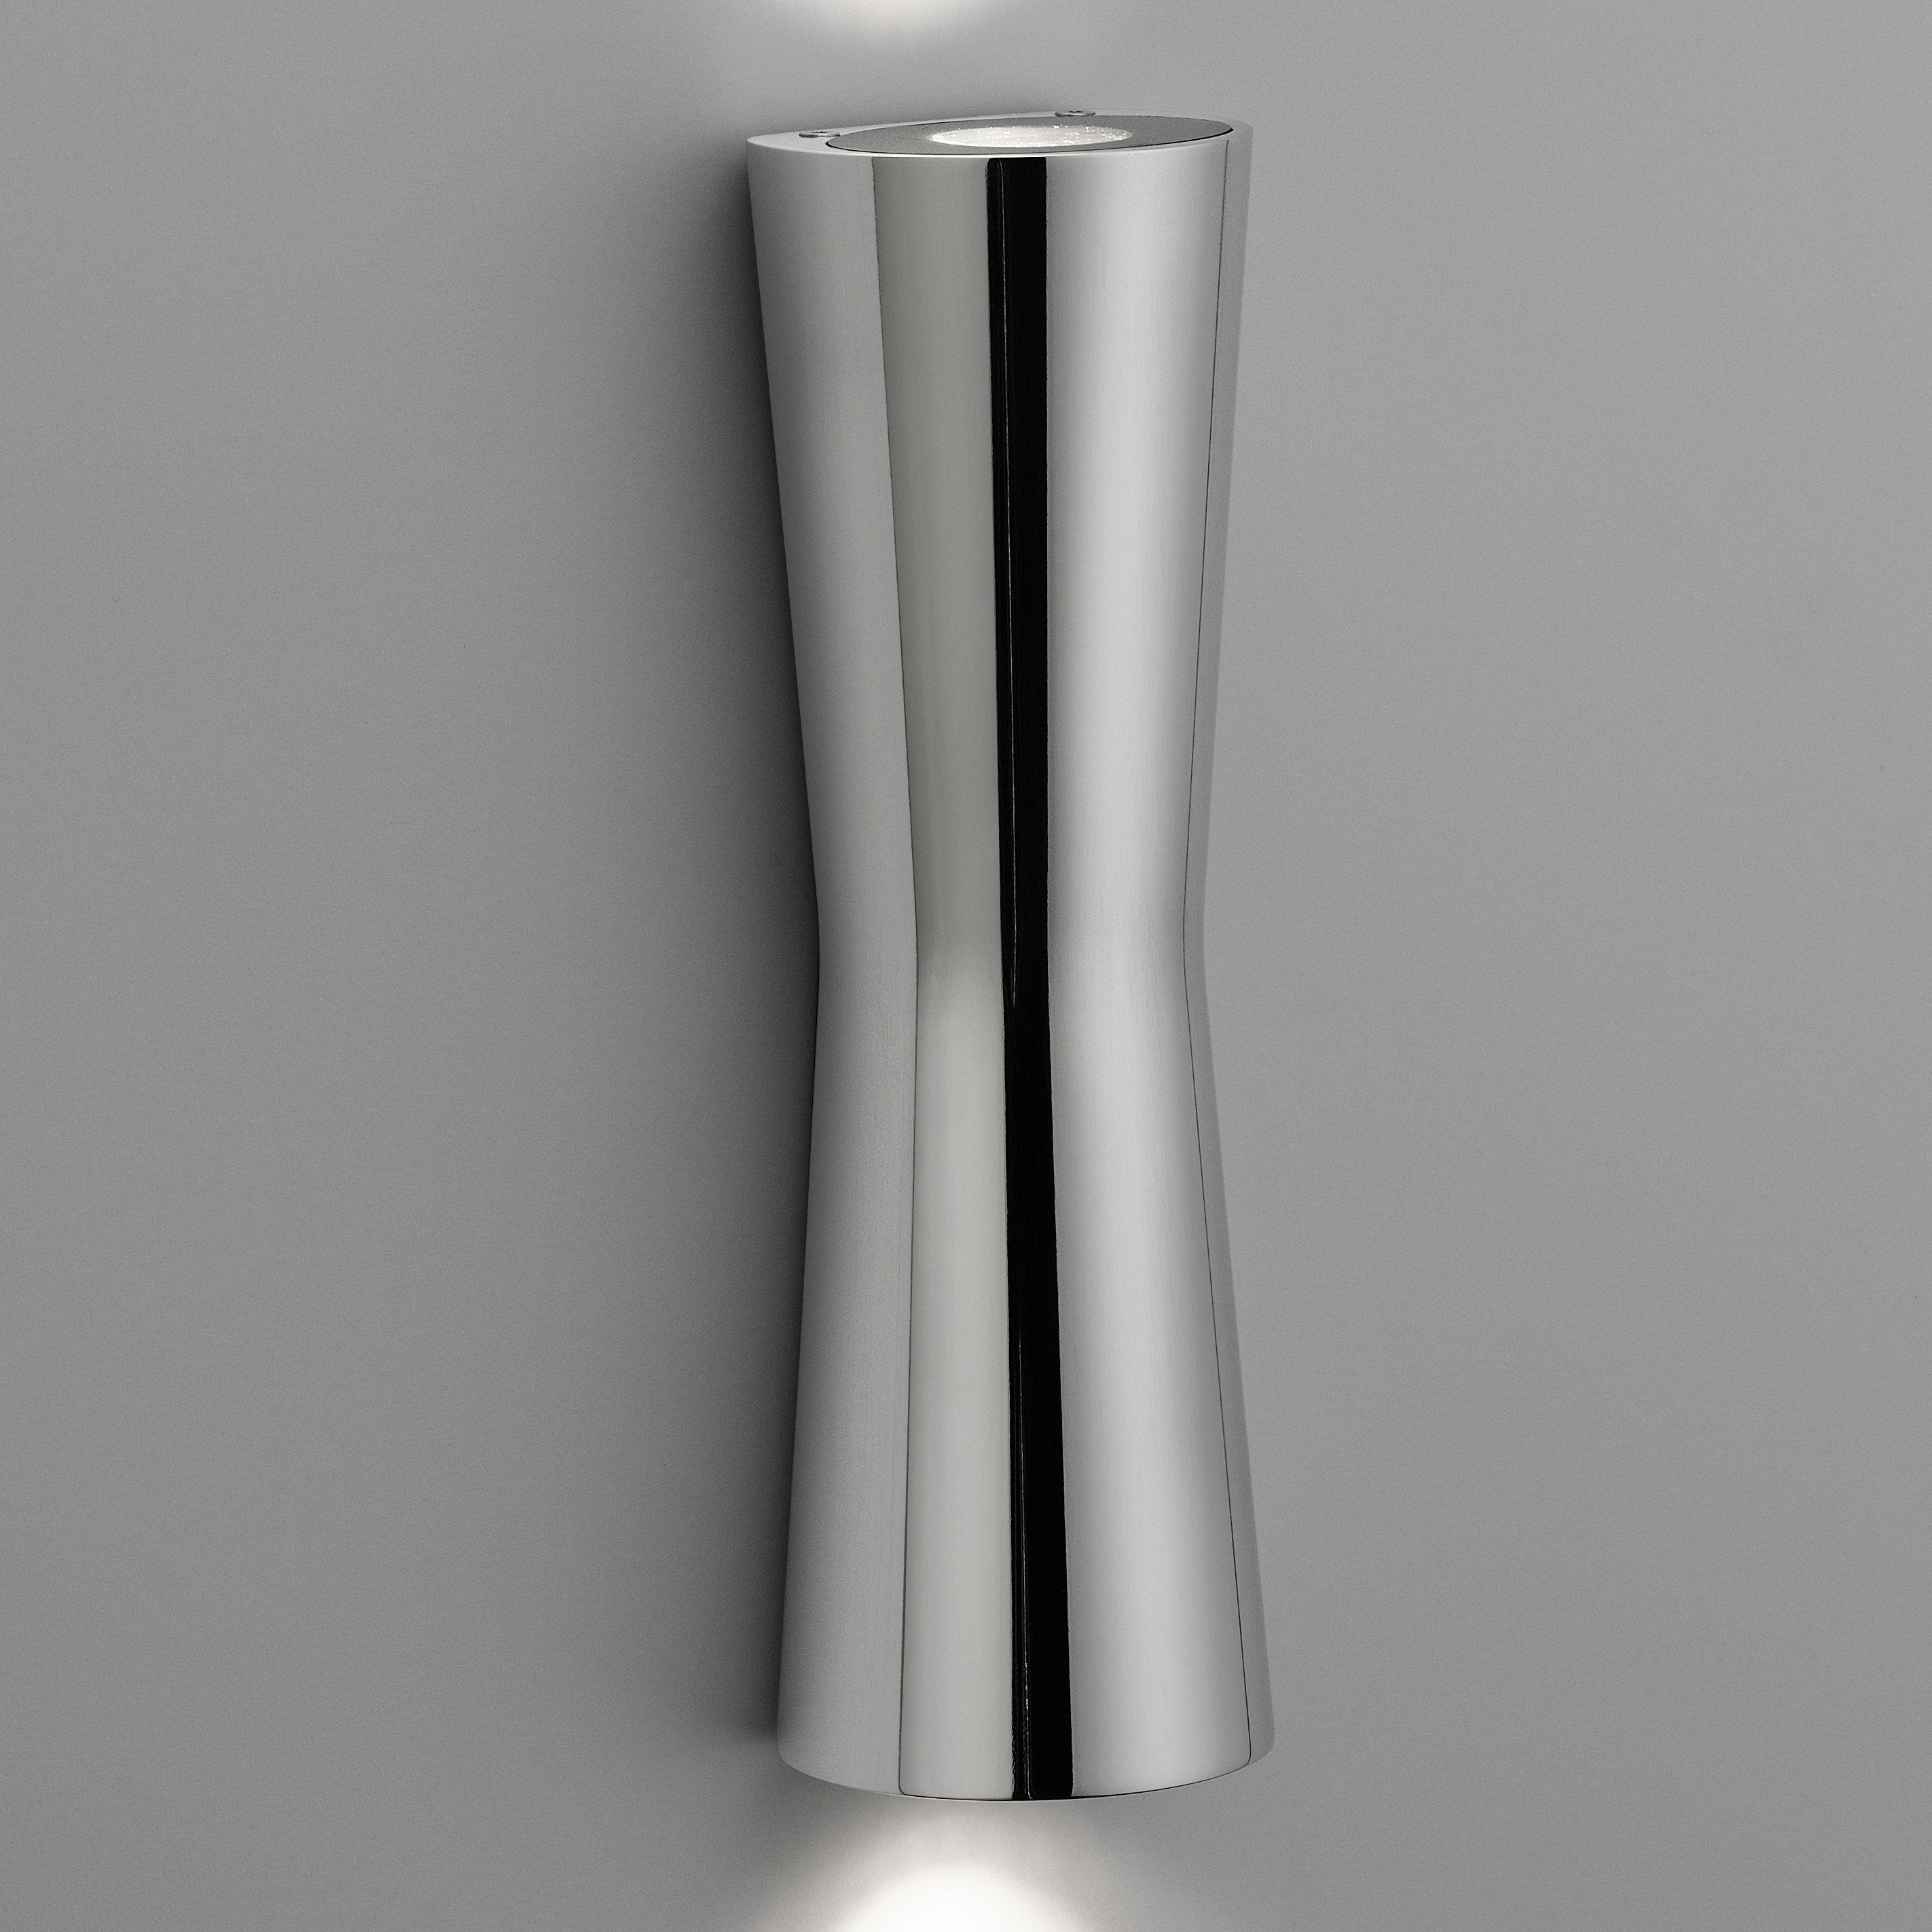 Leuchten - Wandleuchten - Clessidra 20° Wandleuchte LED - für den Inneneinsatz - Flos - Chrom-glänzend - Gussaluminium, PMMA